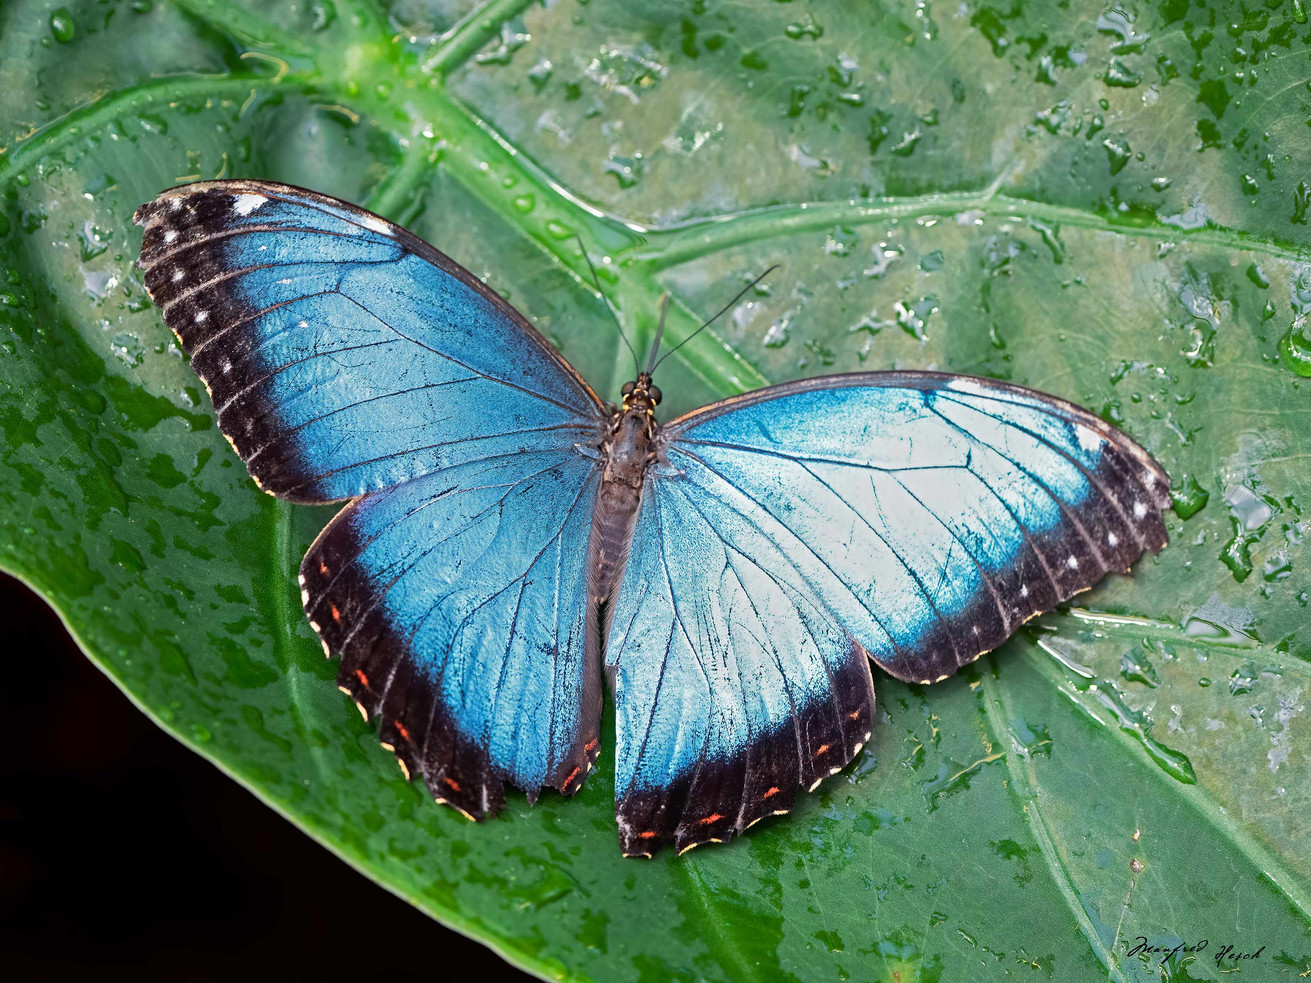 Schmetterling Blauer Morpho - Februar 2020 Botanischer Garten